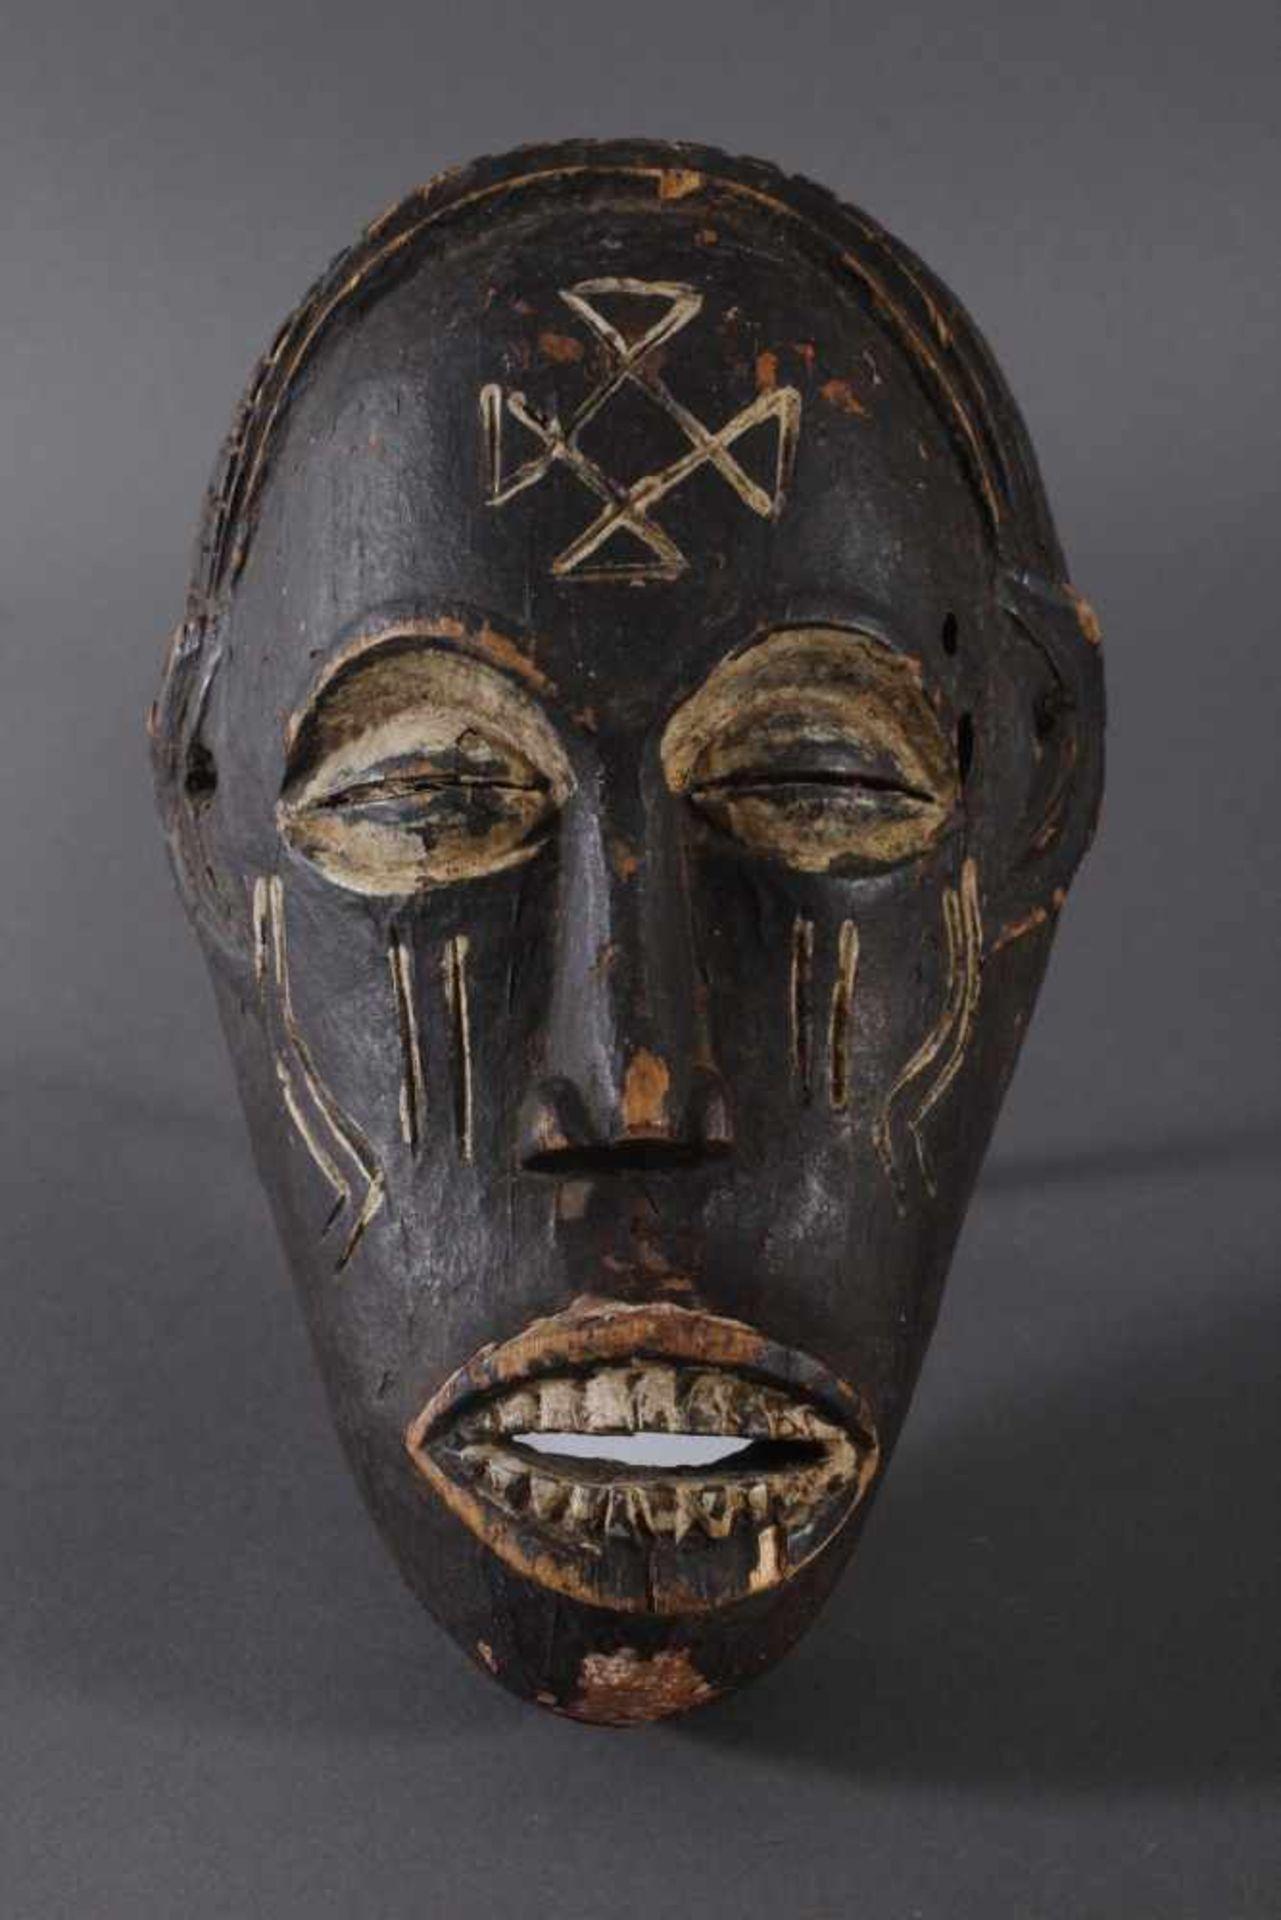 Antike Maske, Chokwe, Angola 1. Hälfte 20. Jh.Holz geschnitzt, dunkle Patina und Kaolin Bemalung,